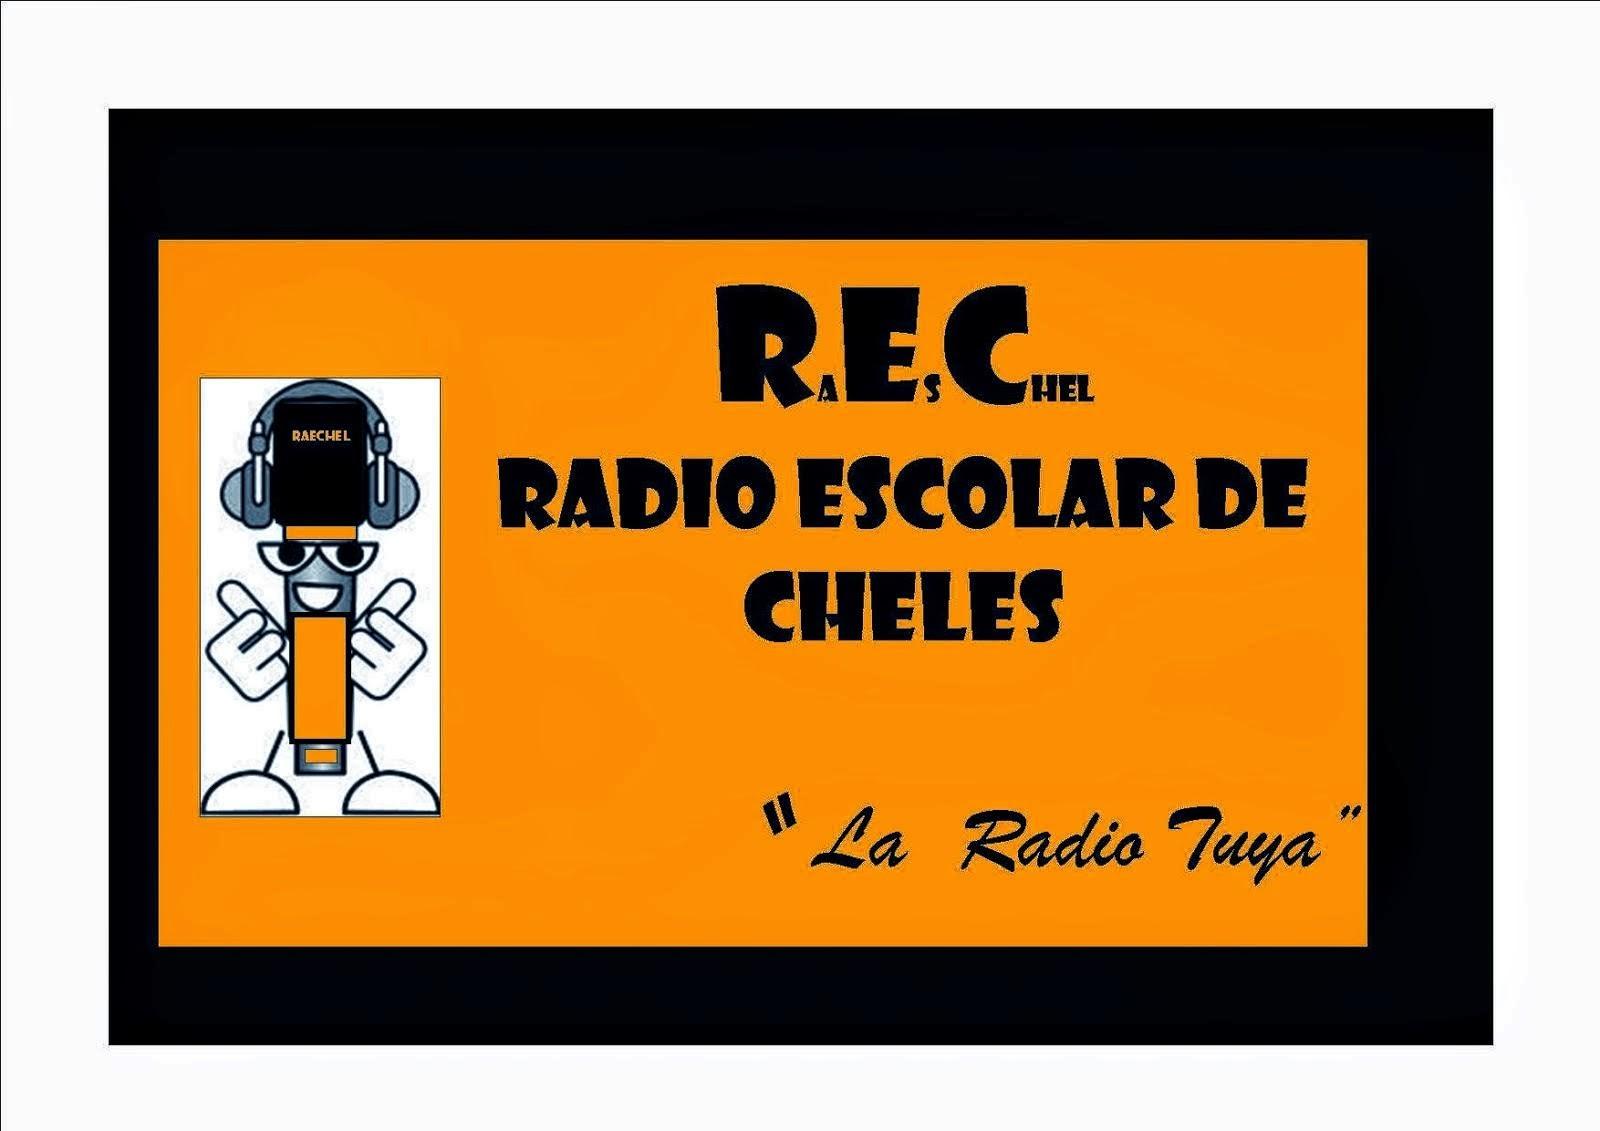 Radio Escolar de Cheles.